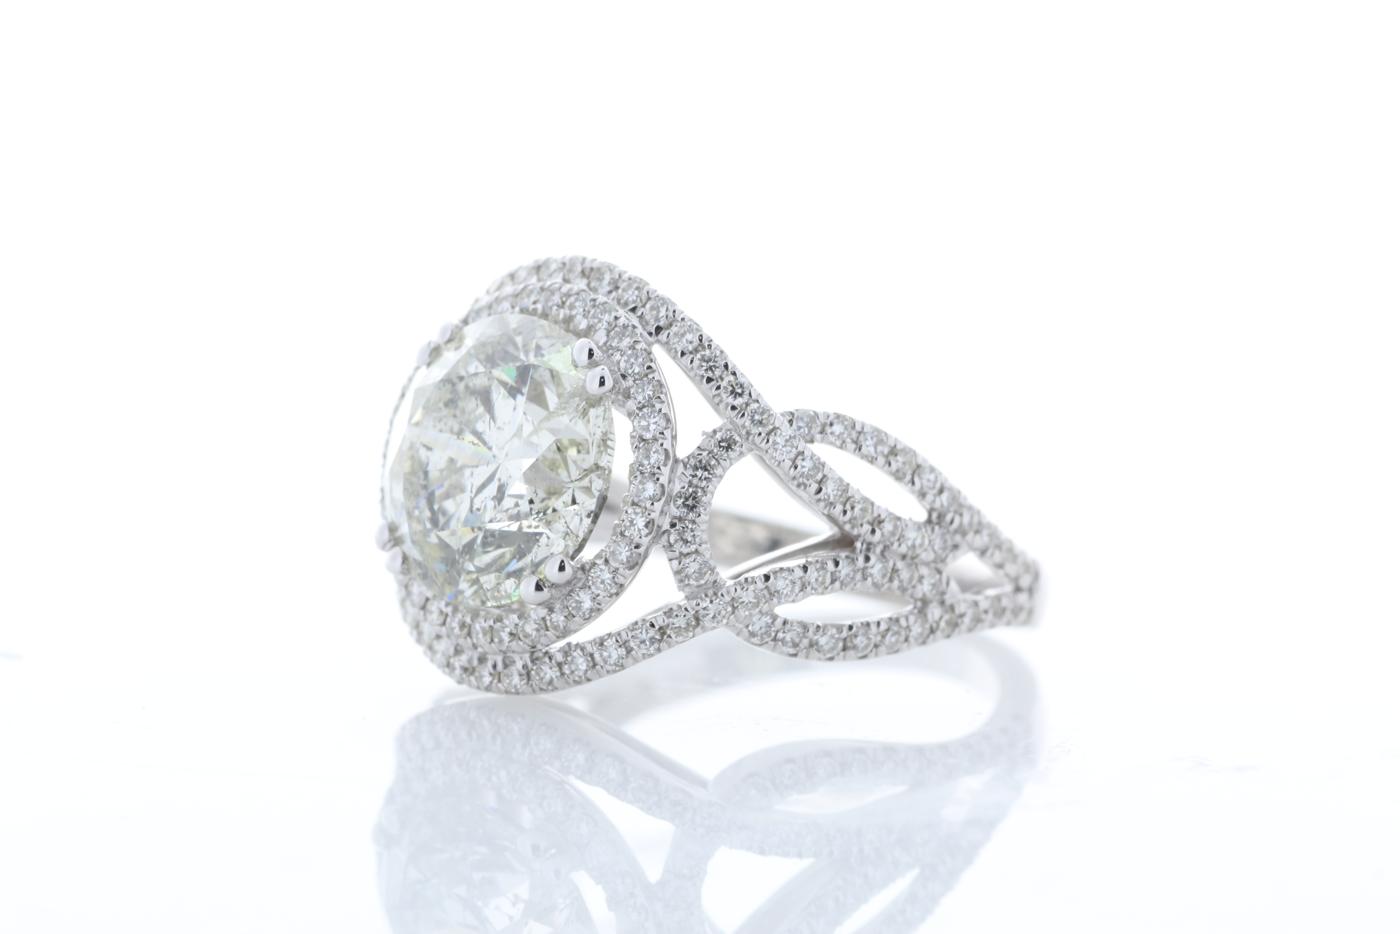 18k White Gold Single Stone With Halo Setting Ring 5.17